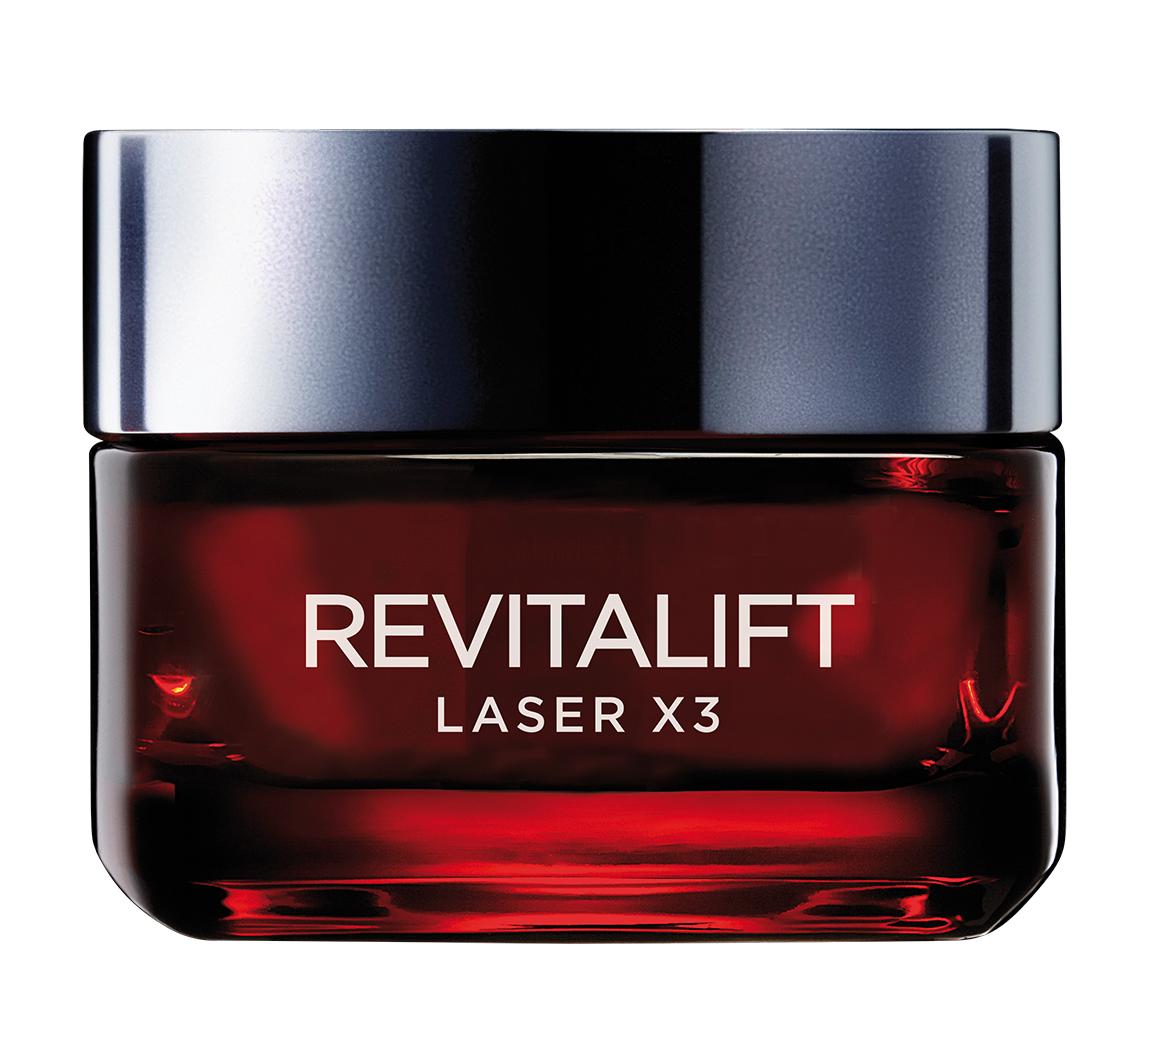 Revitalift-Laser-Day-Product-Shot_-_trans-2